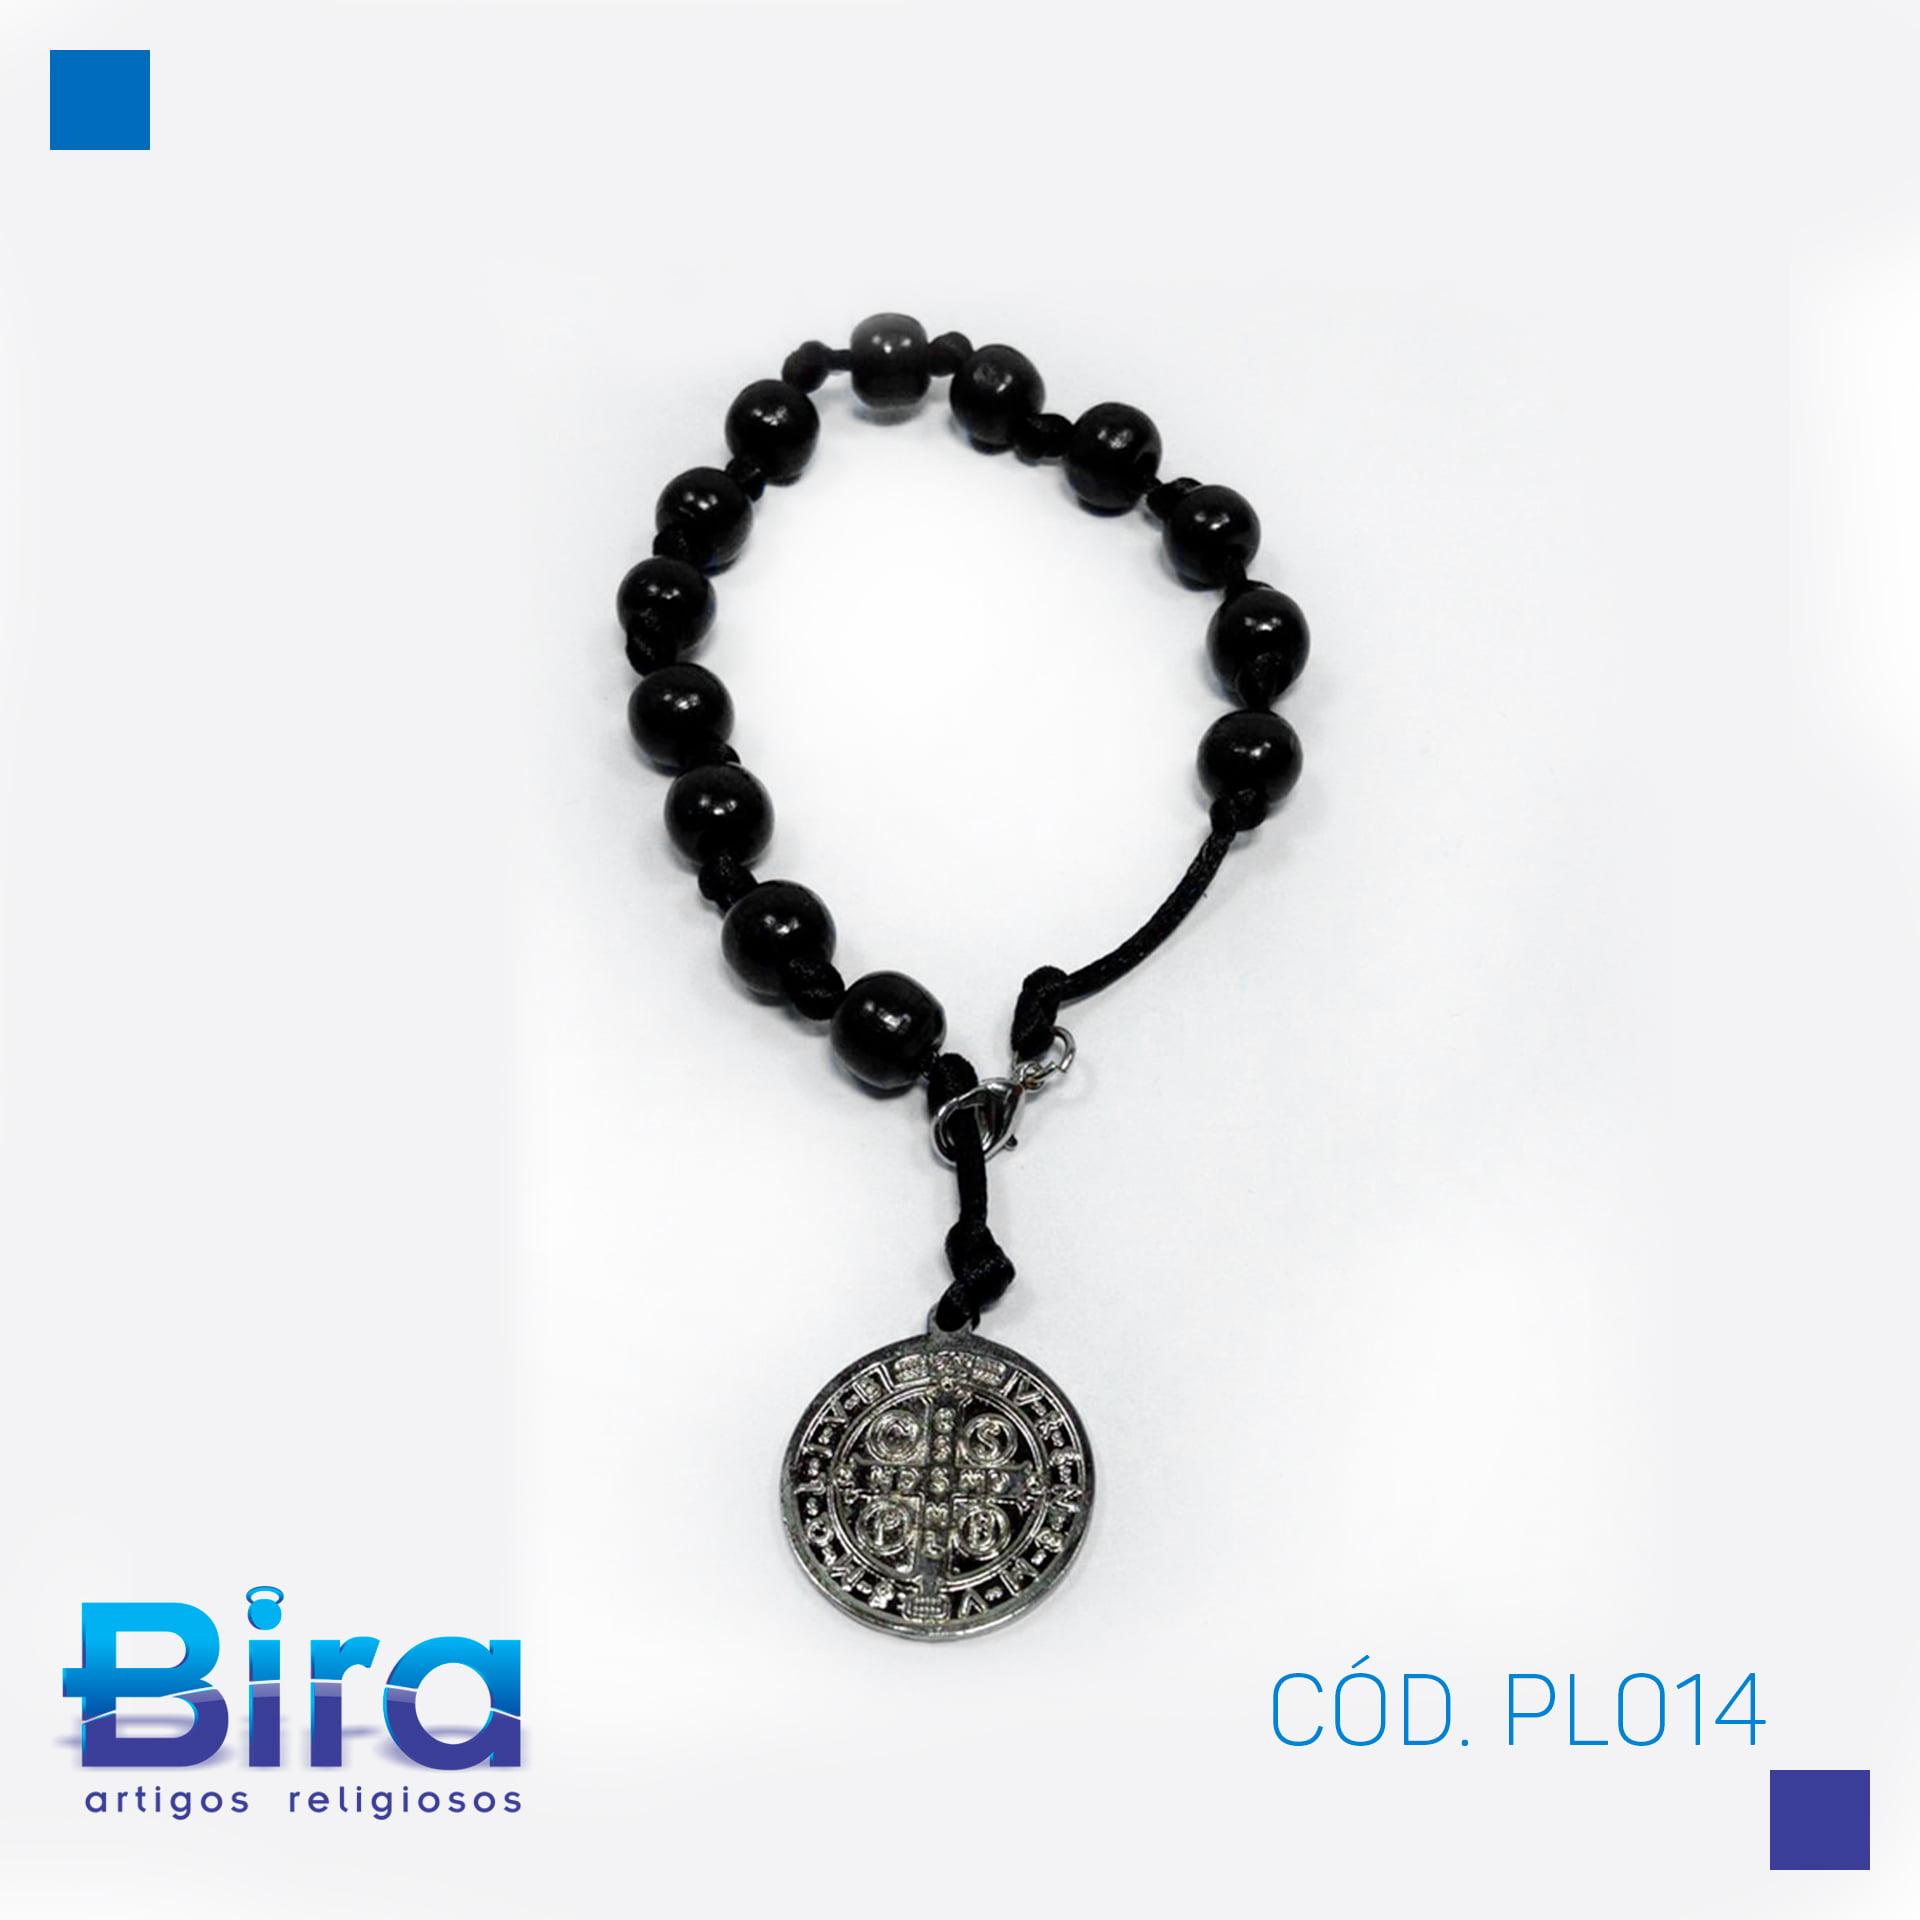 Bira Artigos Religiosos - PUL MADEIRA  N10 C/FECHO SAO BENTO 3 UNI - CÓD. PL014